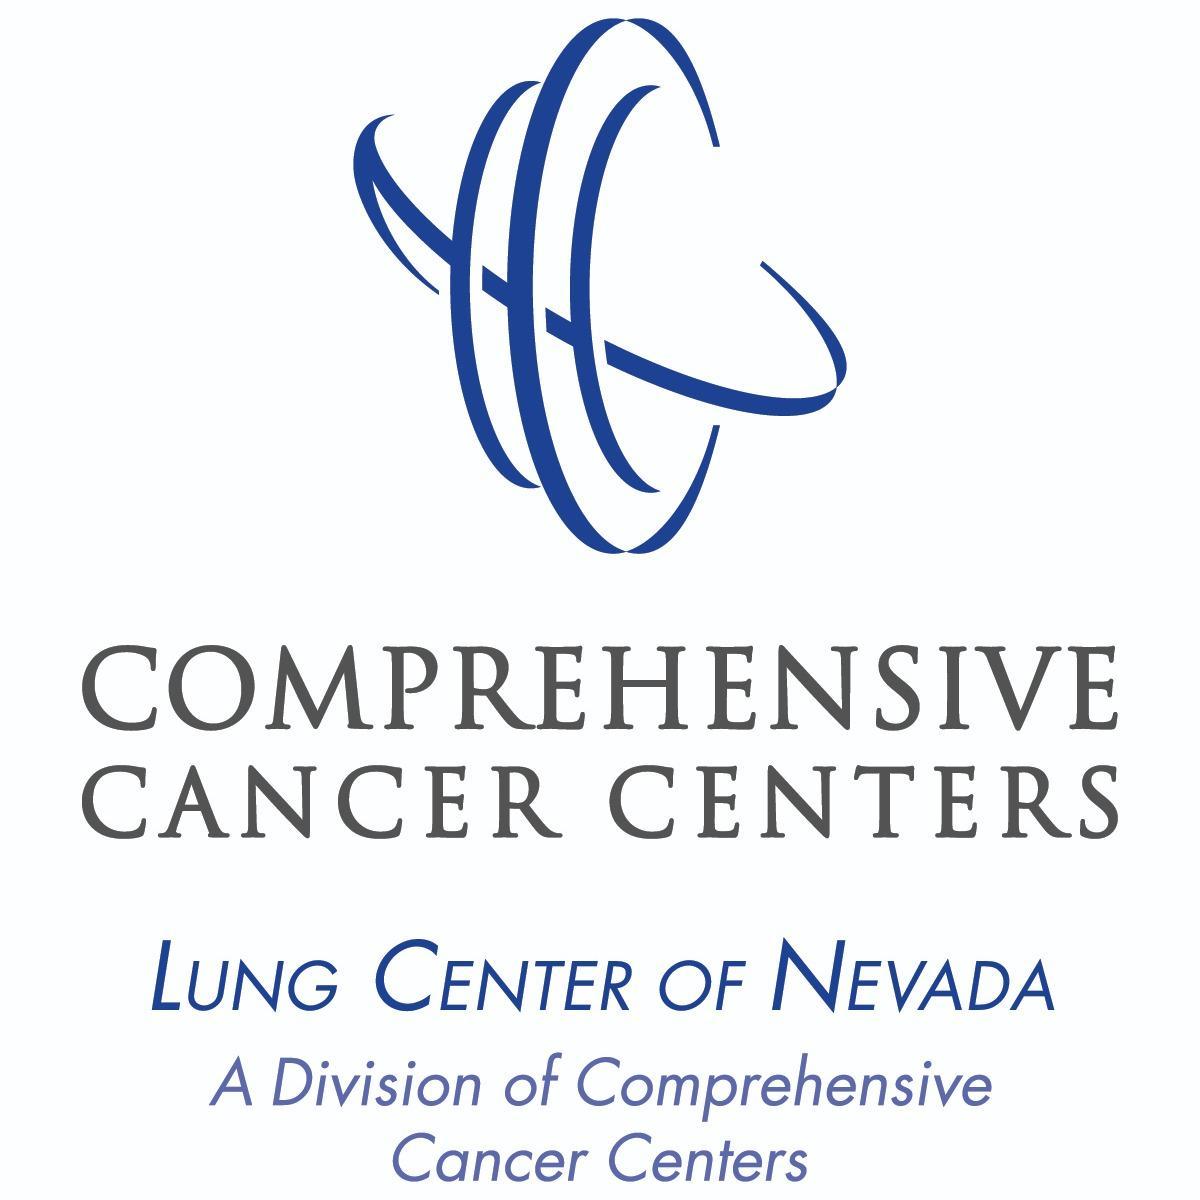 Comprehensive Cancer Centers of Nevada  - Lung Center (Tenaya Way)